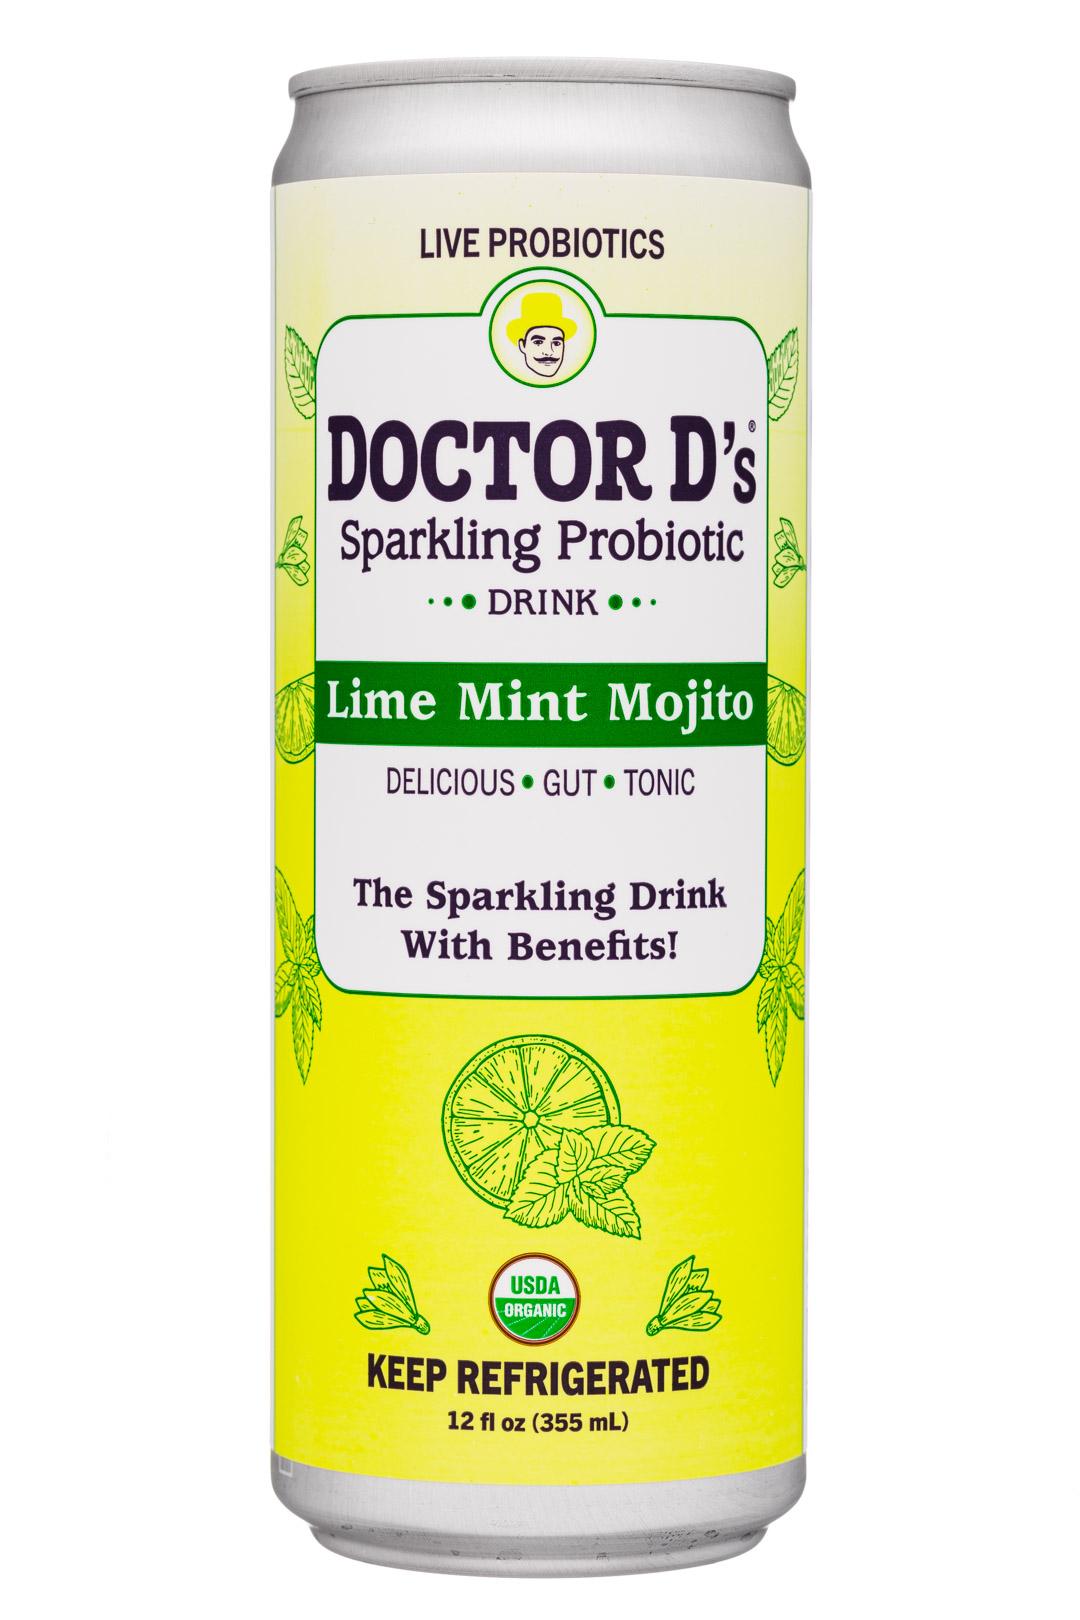 Lime Mint Mojito 2020